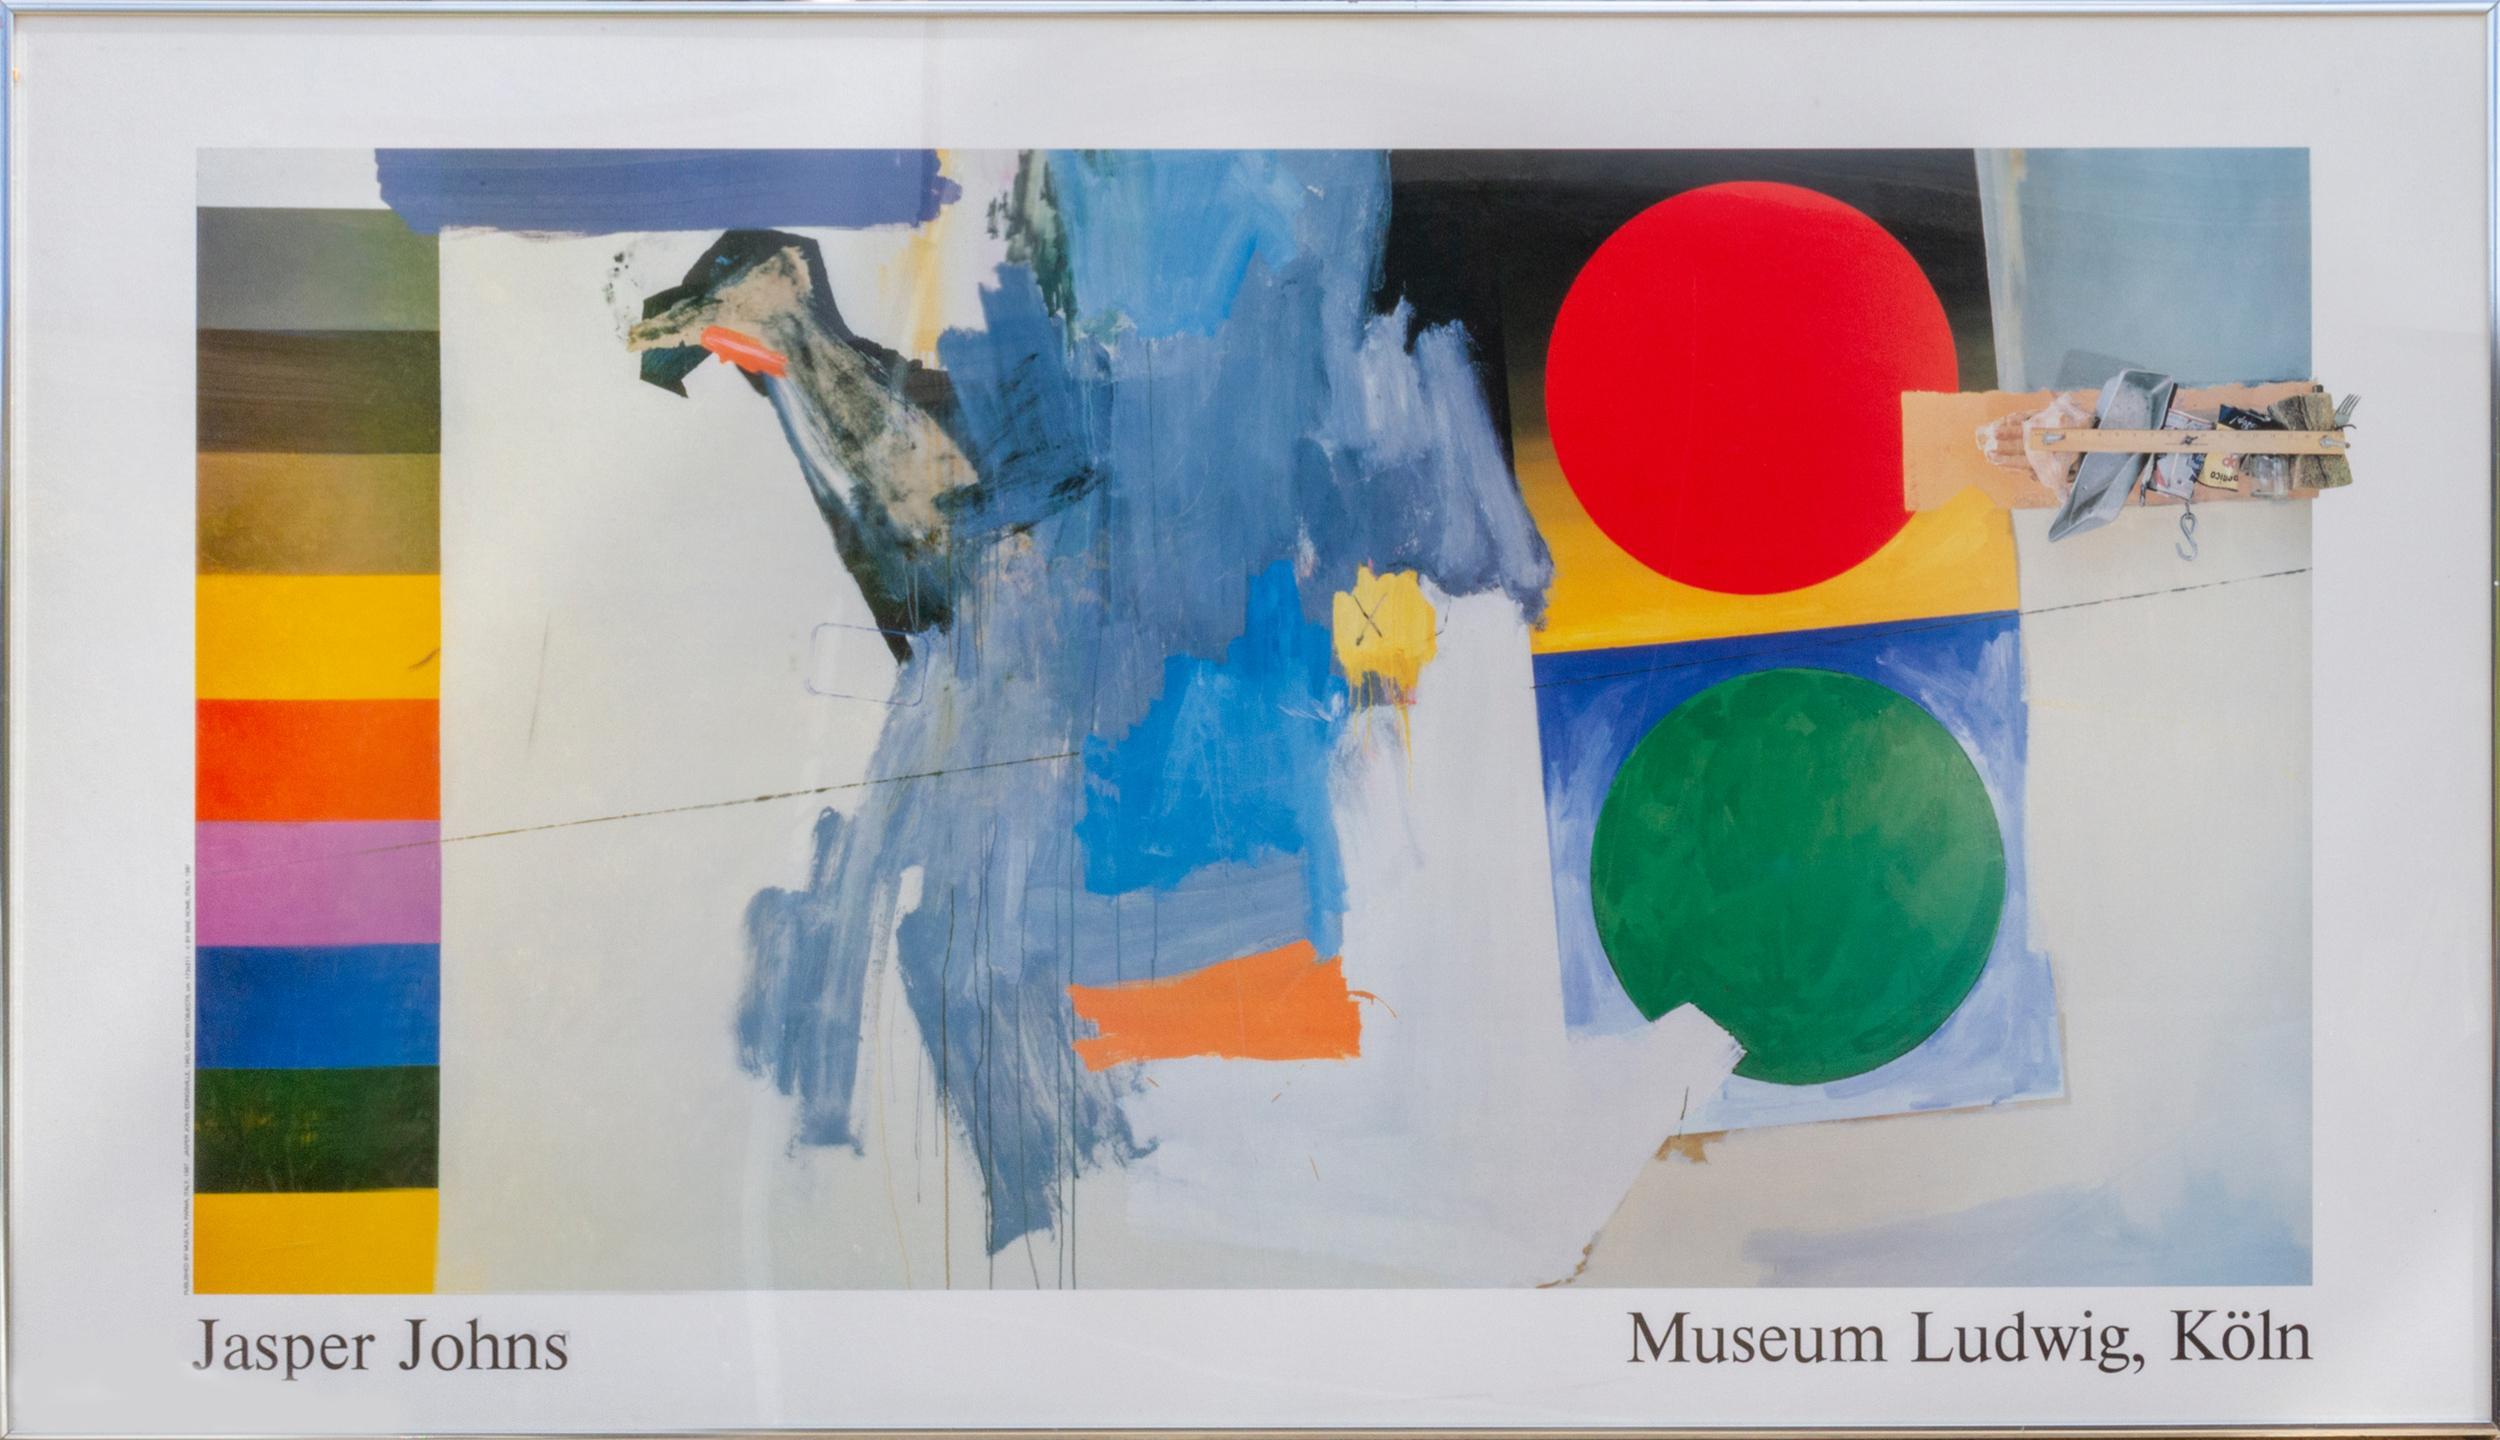 Jasper Johns, Museum Ludwig, Koln, Poster